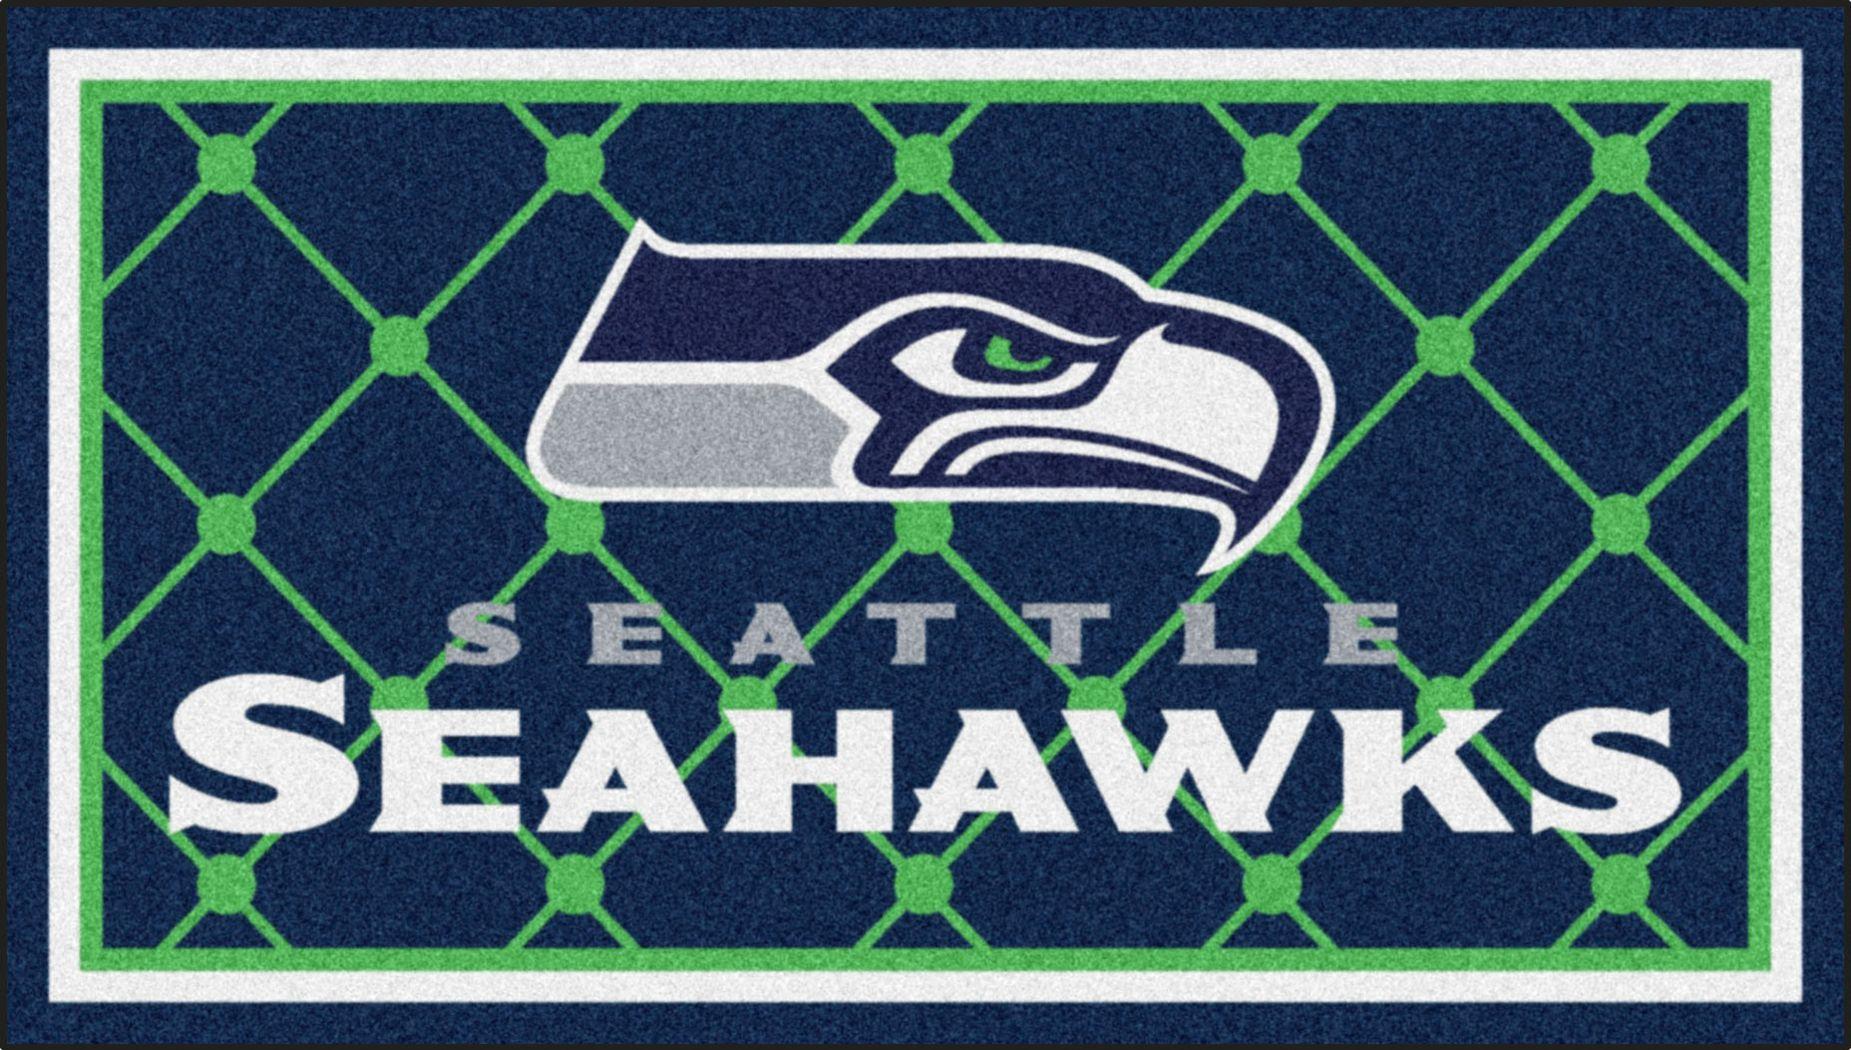 NFL Big Game Seattle Seahawks 3' x 5' Rug